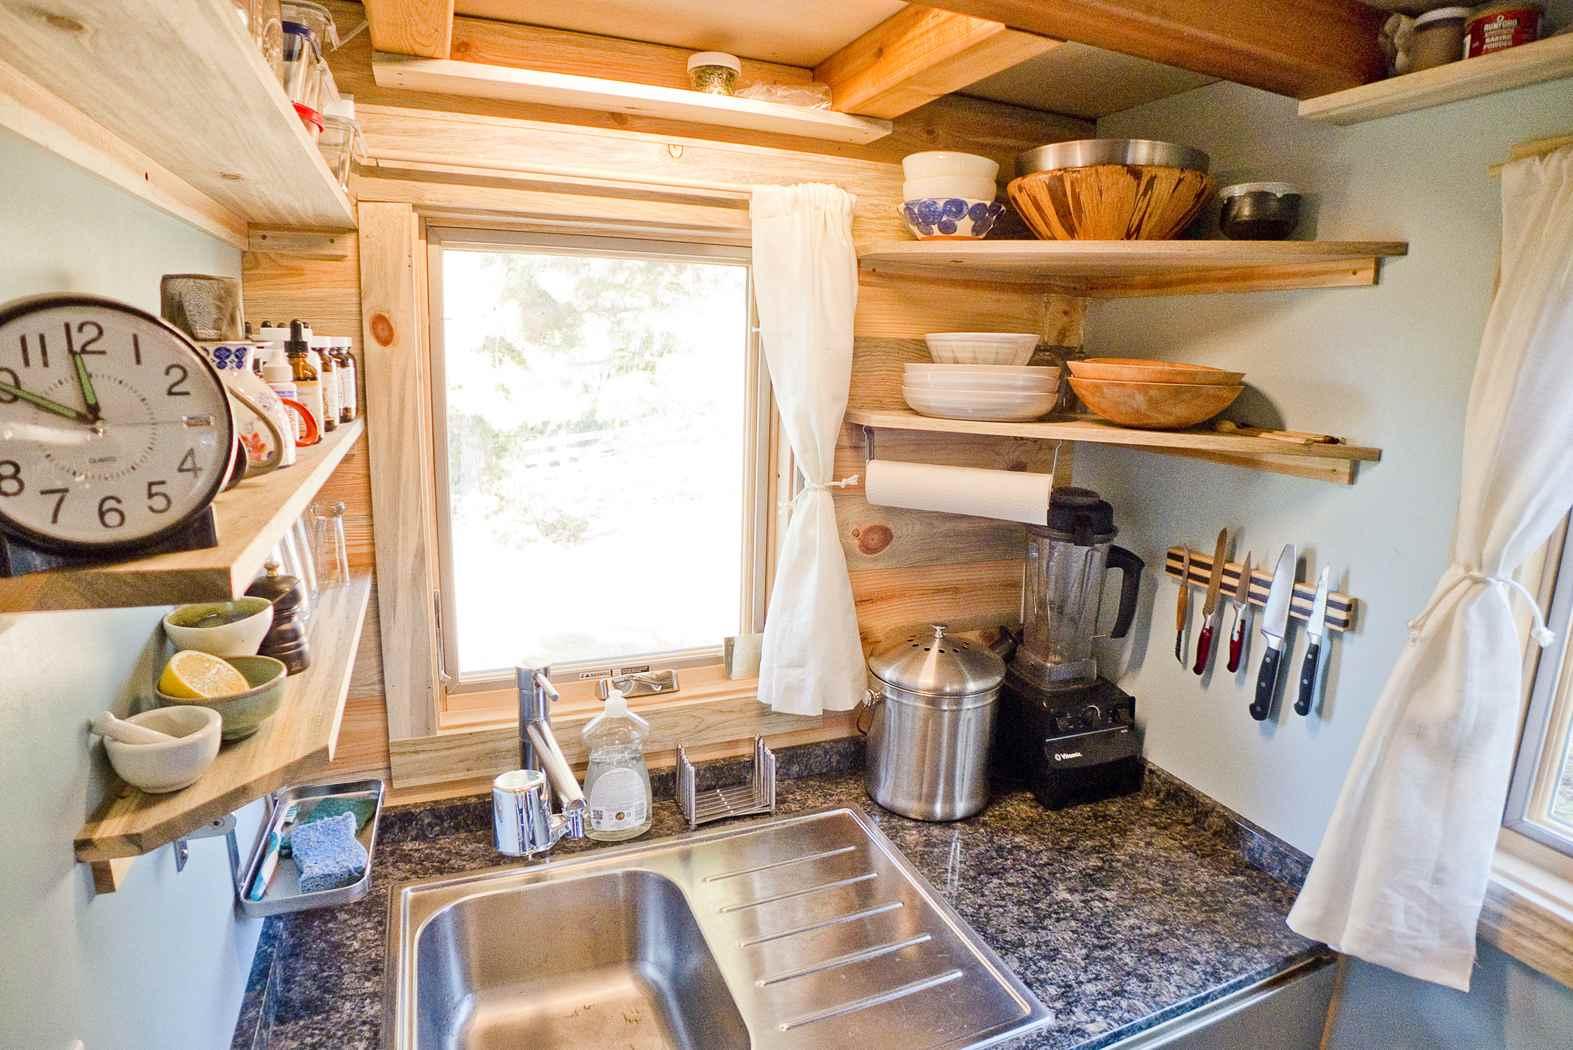 Corner-Shelving-in-Tiny-Kitchen